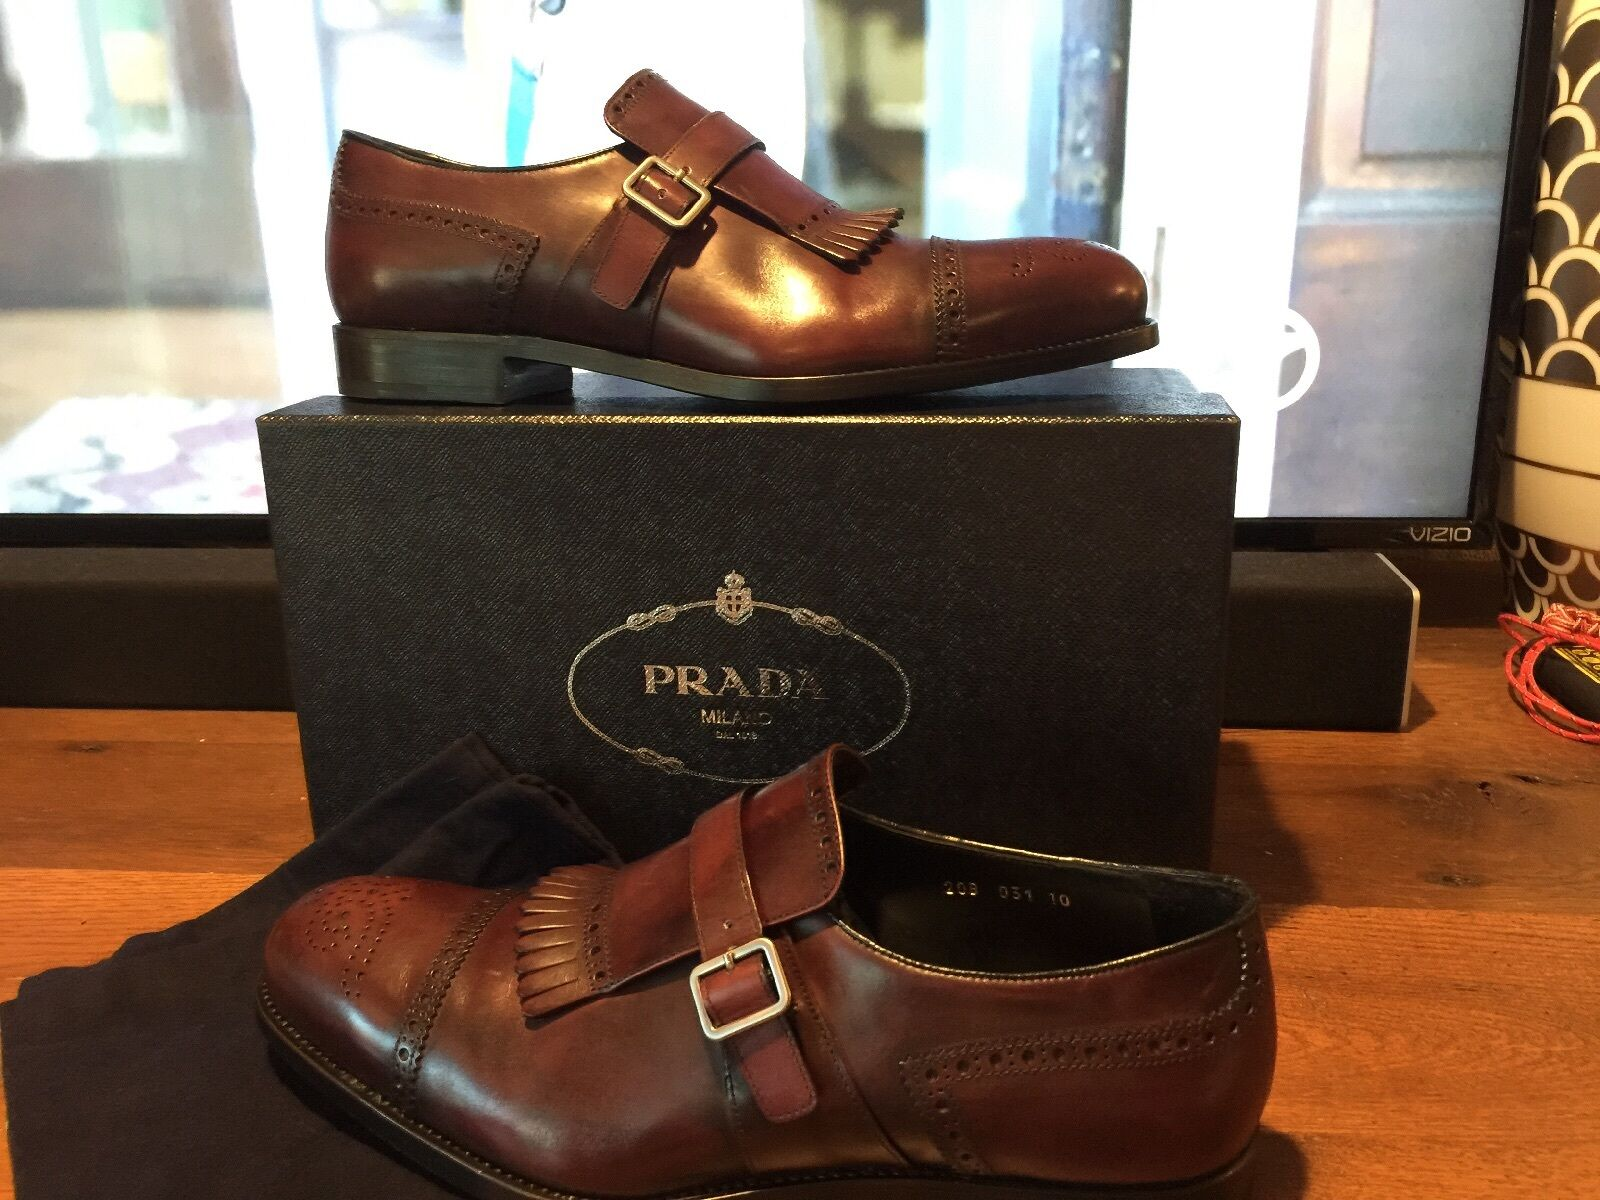 Man's/Woman's Prada Mens Shoes Charming design Online Different goods